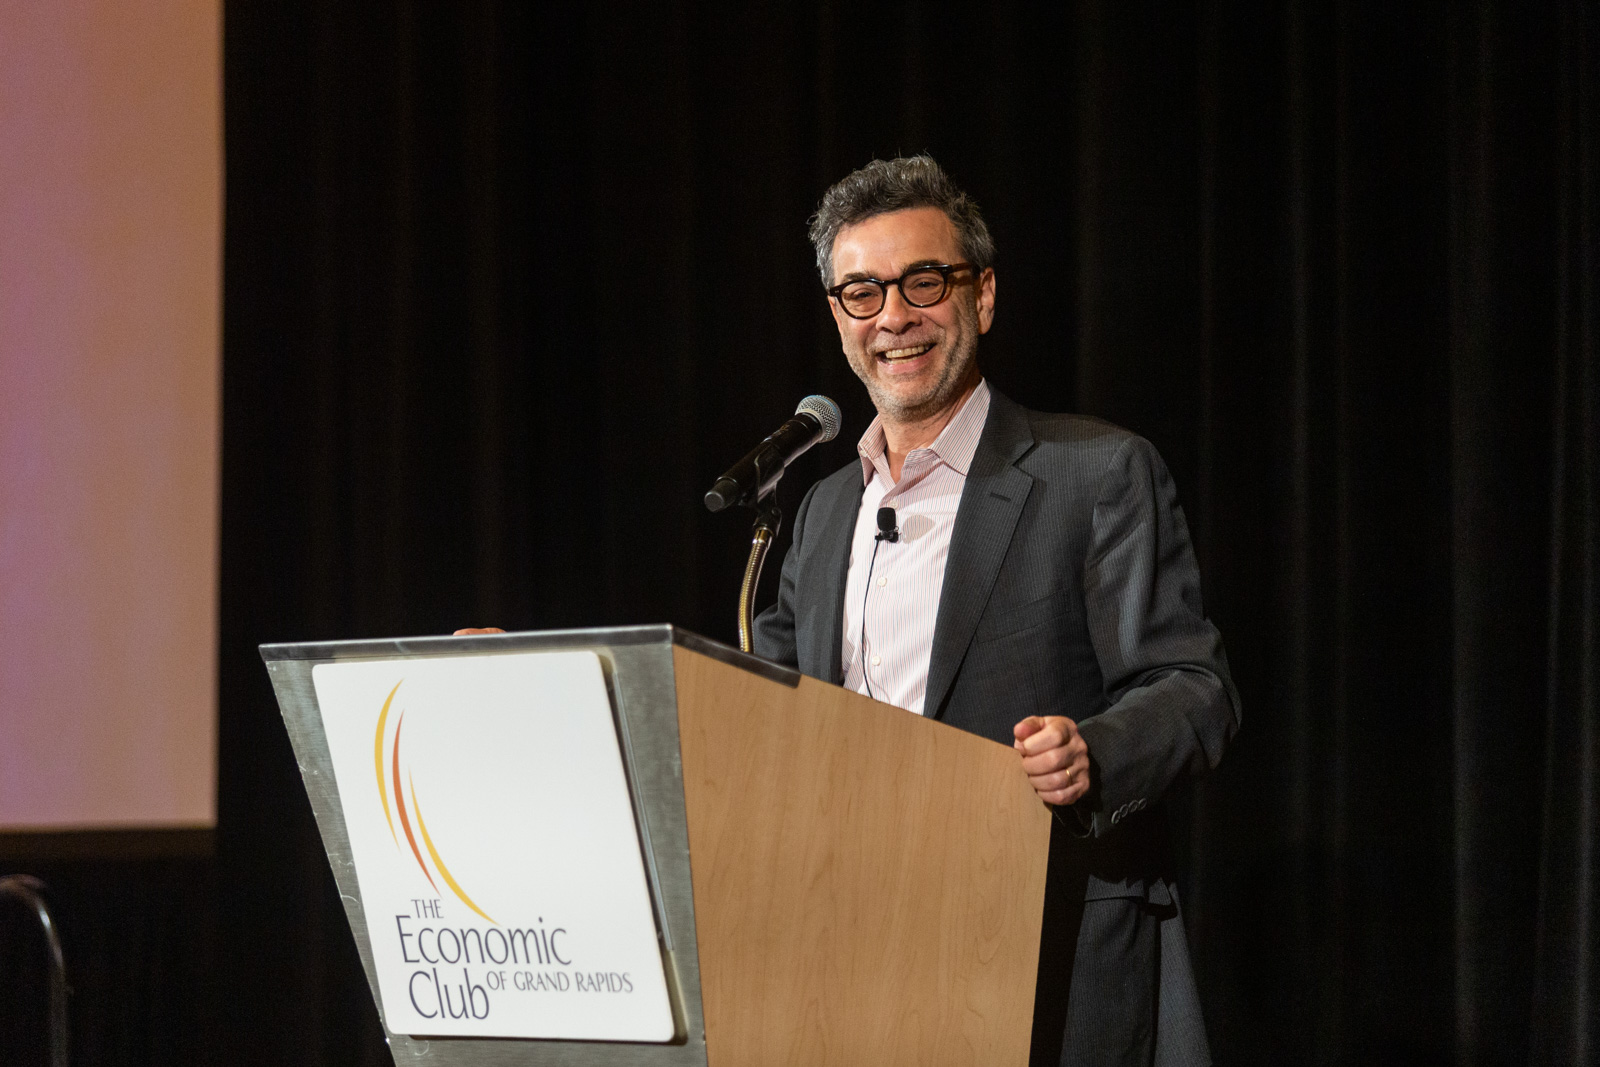 Stephen Dubner, Economist and Best Selling Author of Freakonomics